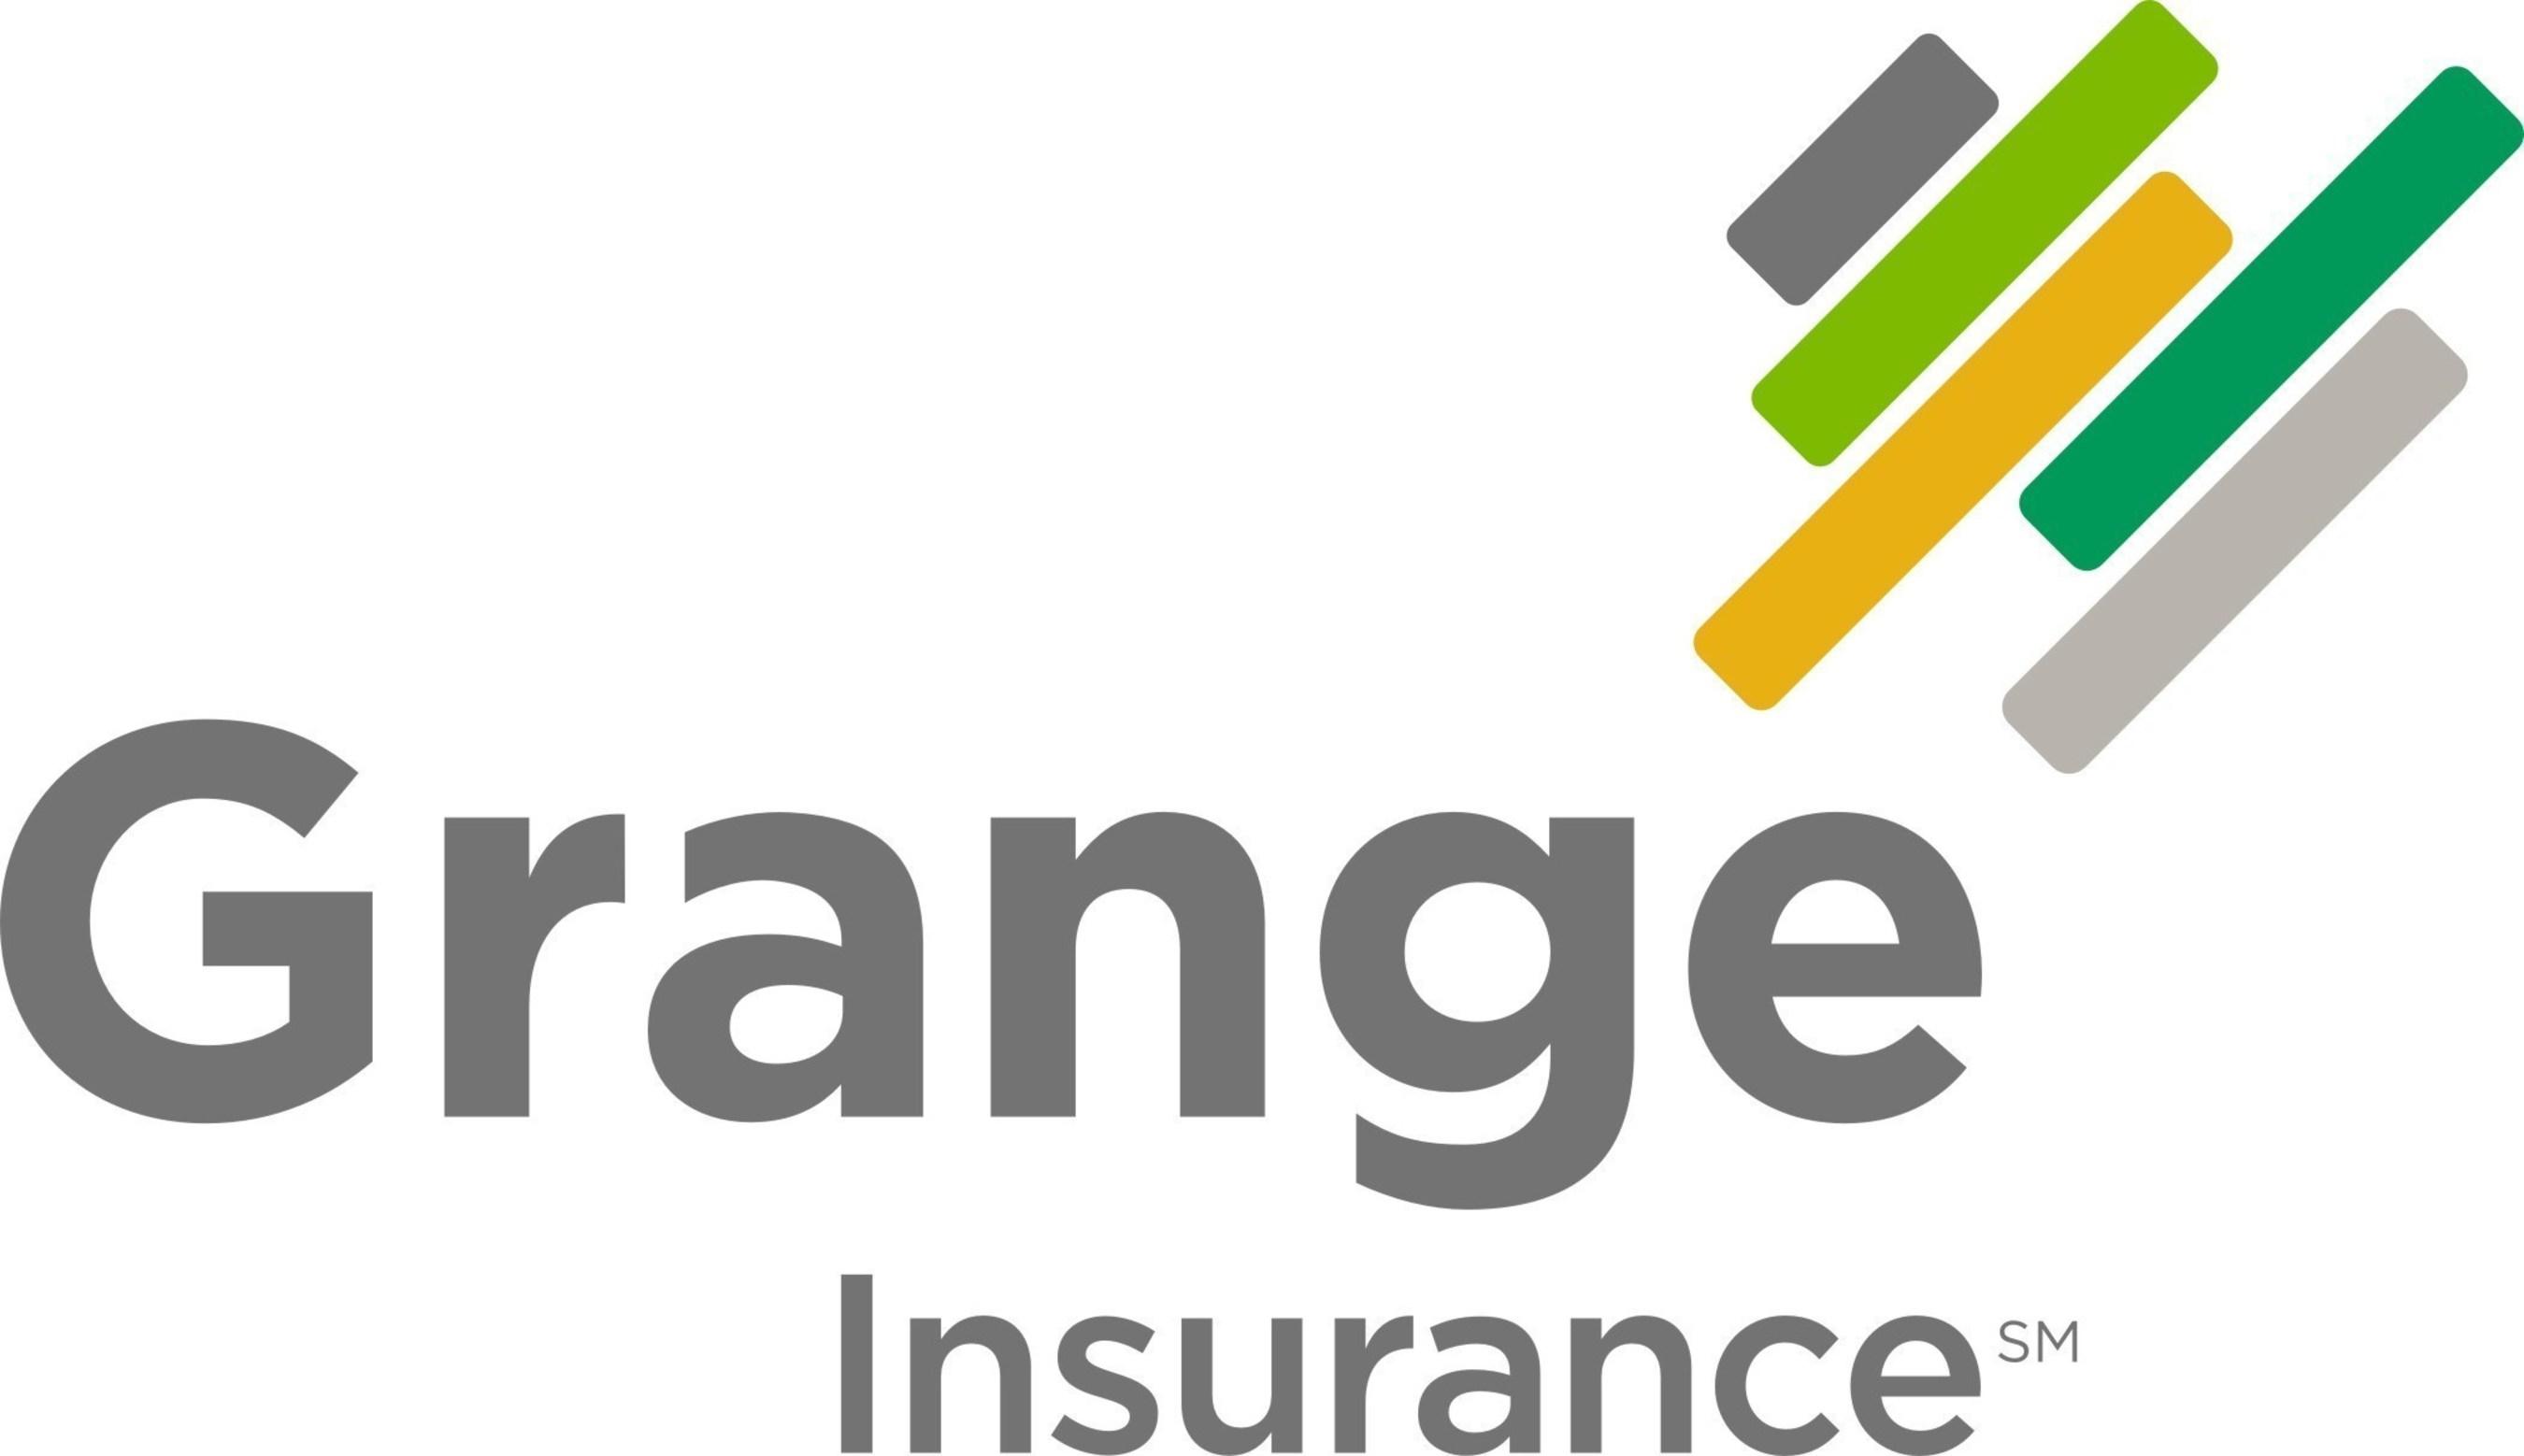 Grange Insurance Awarded Leed Green Building Silver Certification